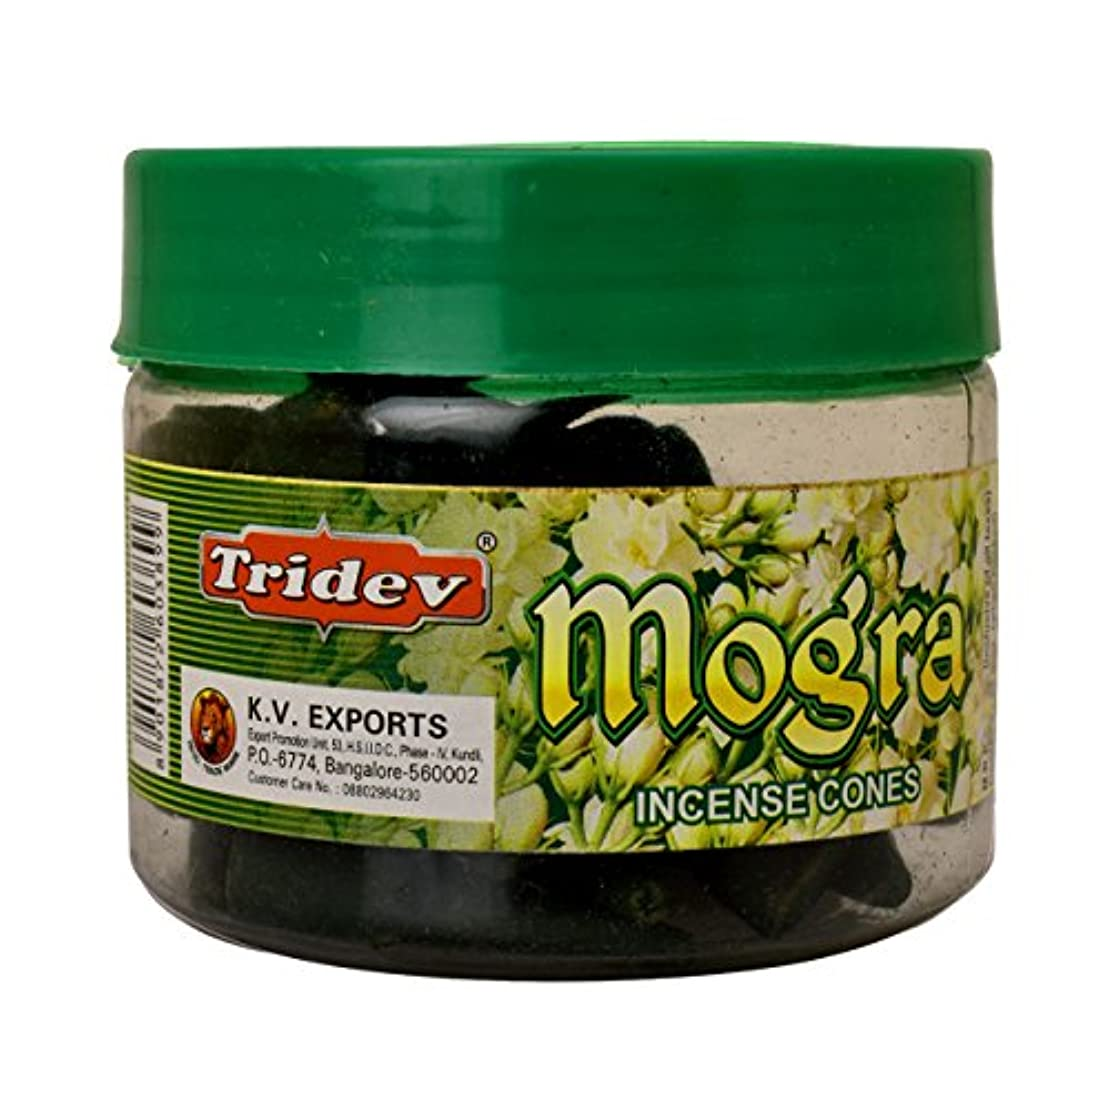 Tridev Mogra Incense Cones Jar 90グラムパック